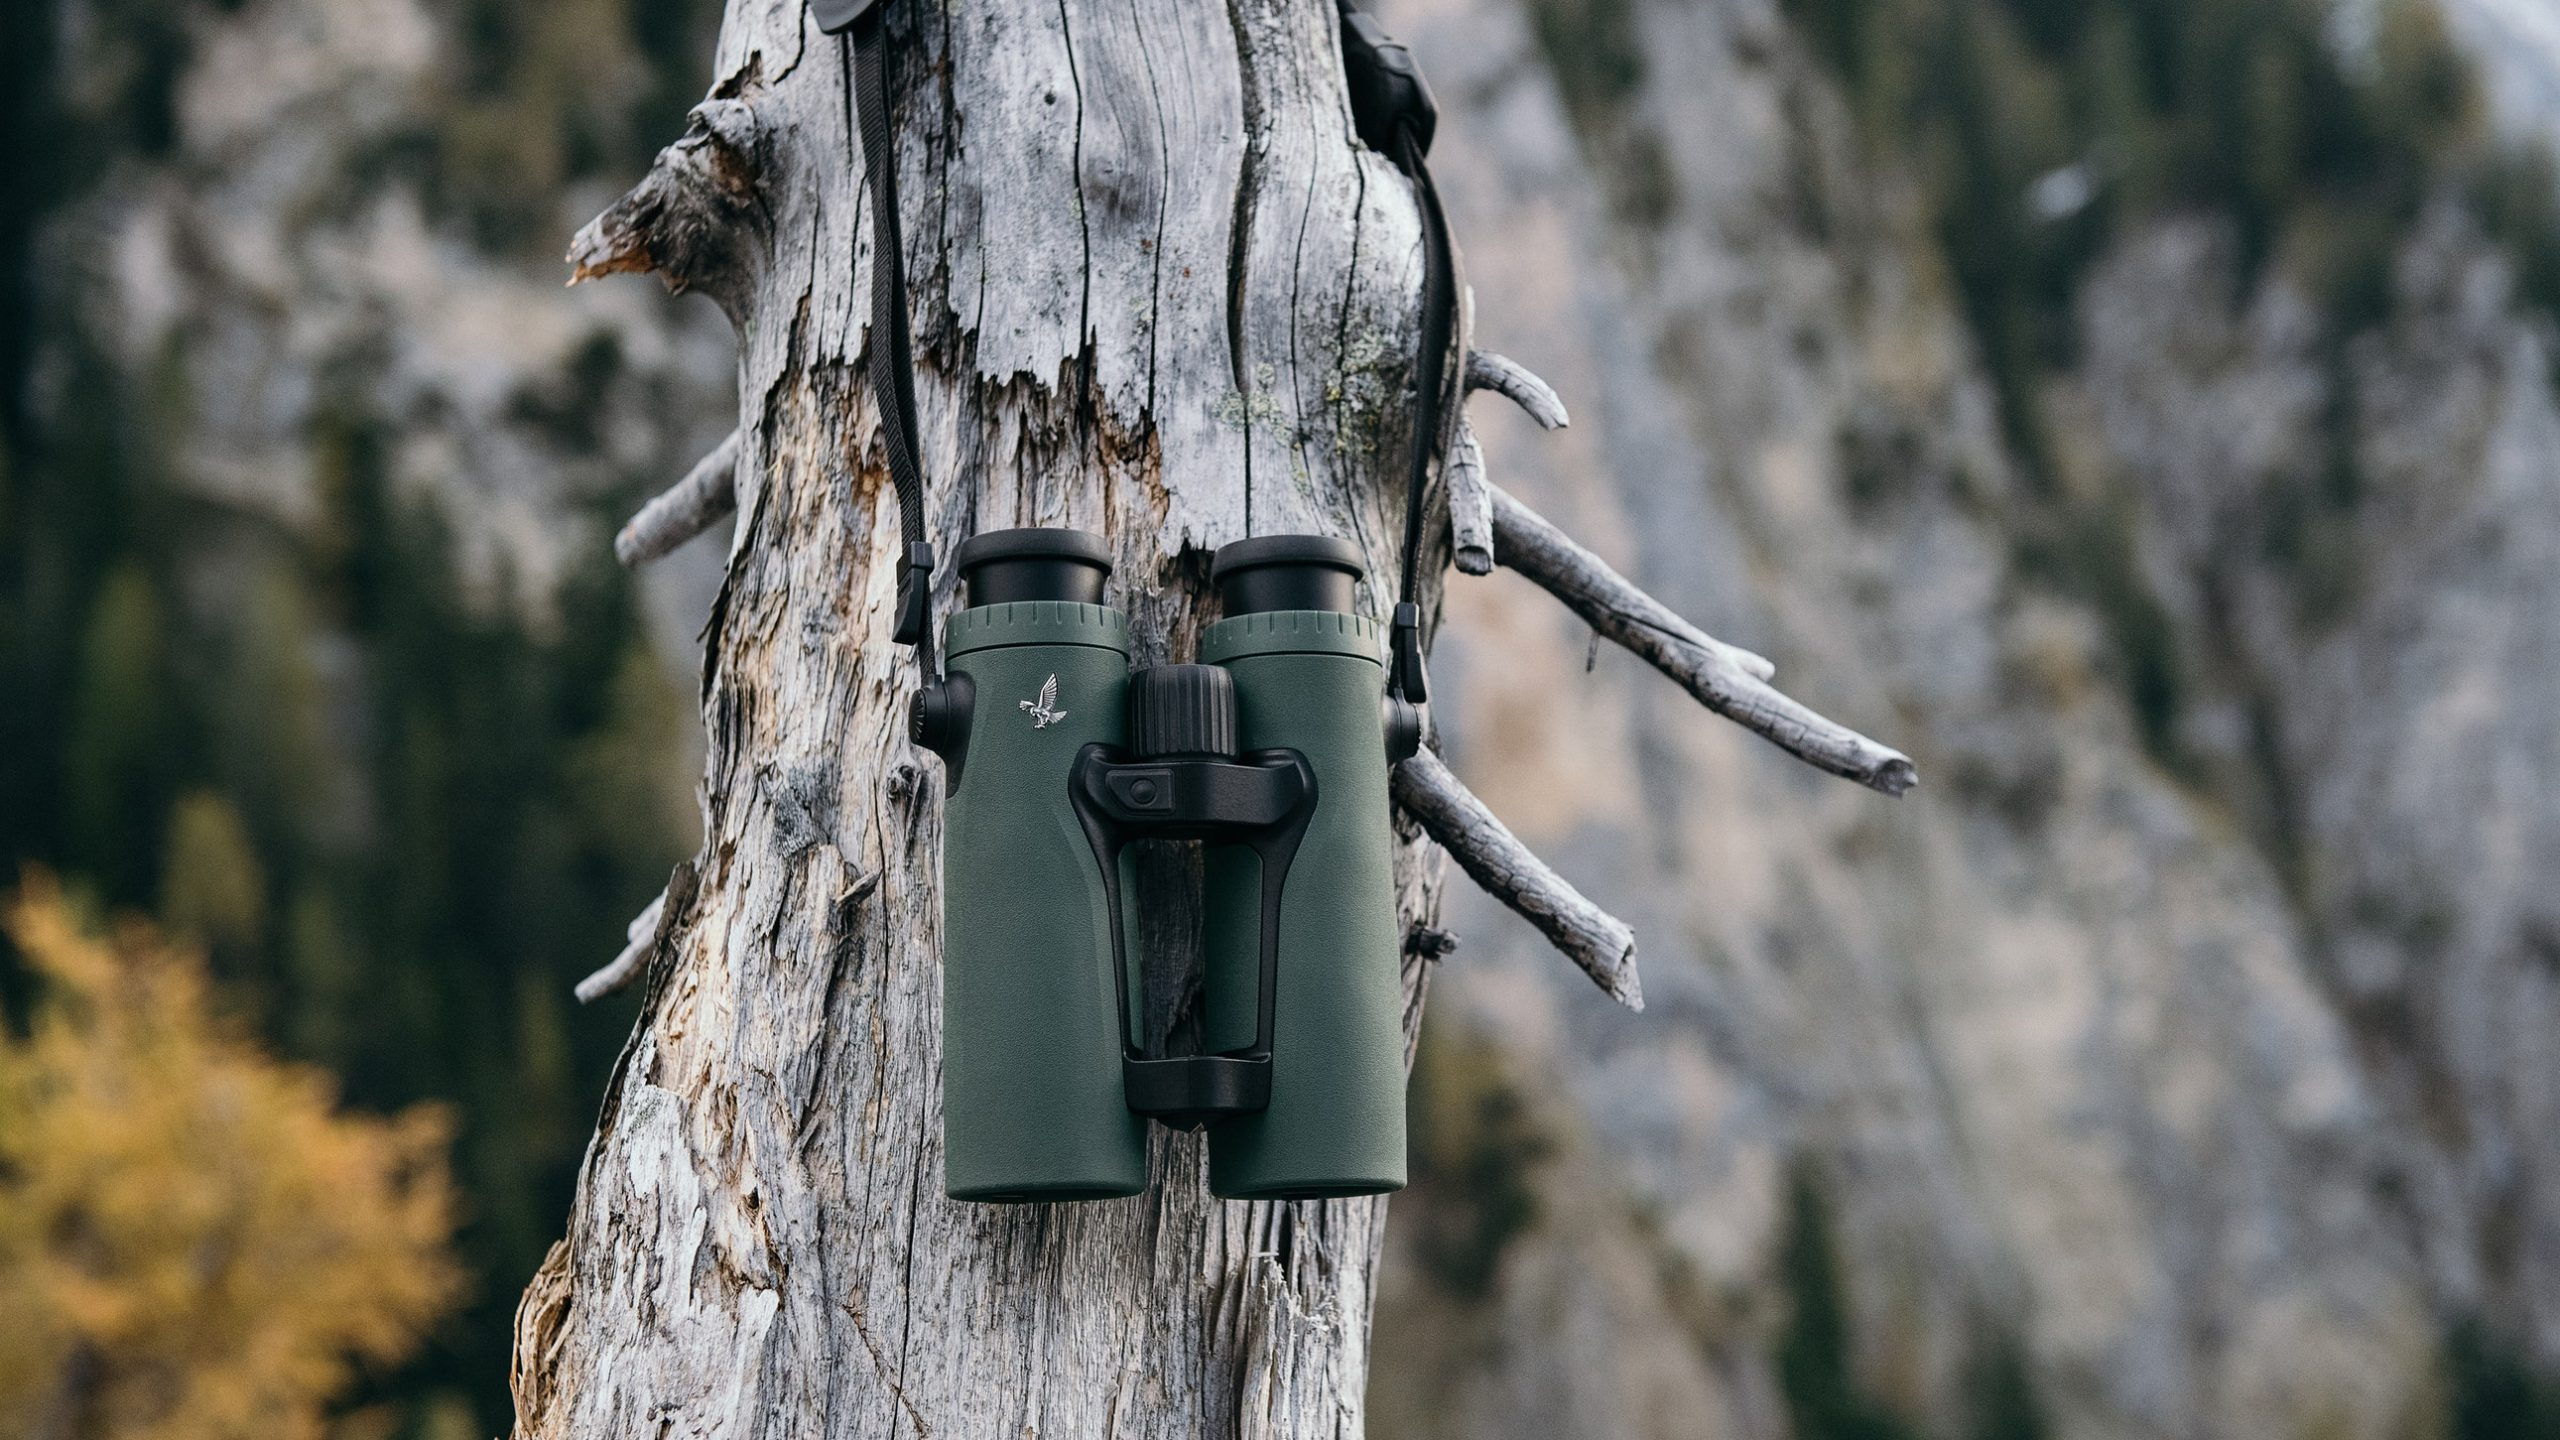 The Best Binoculars for Birding, Stargazing, and Safaris